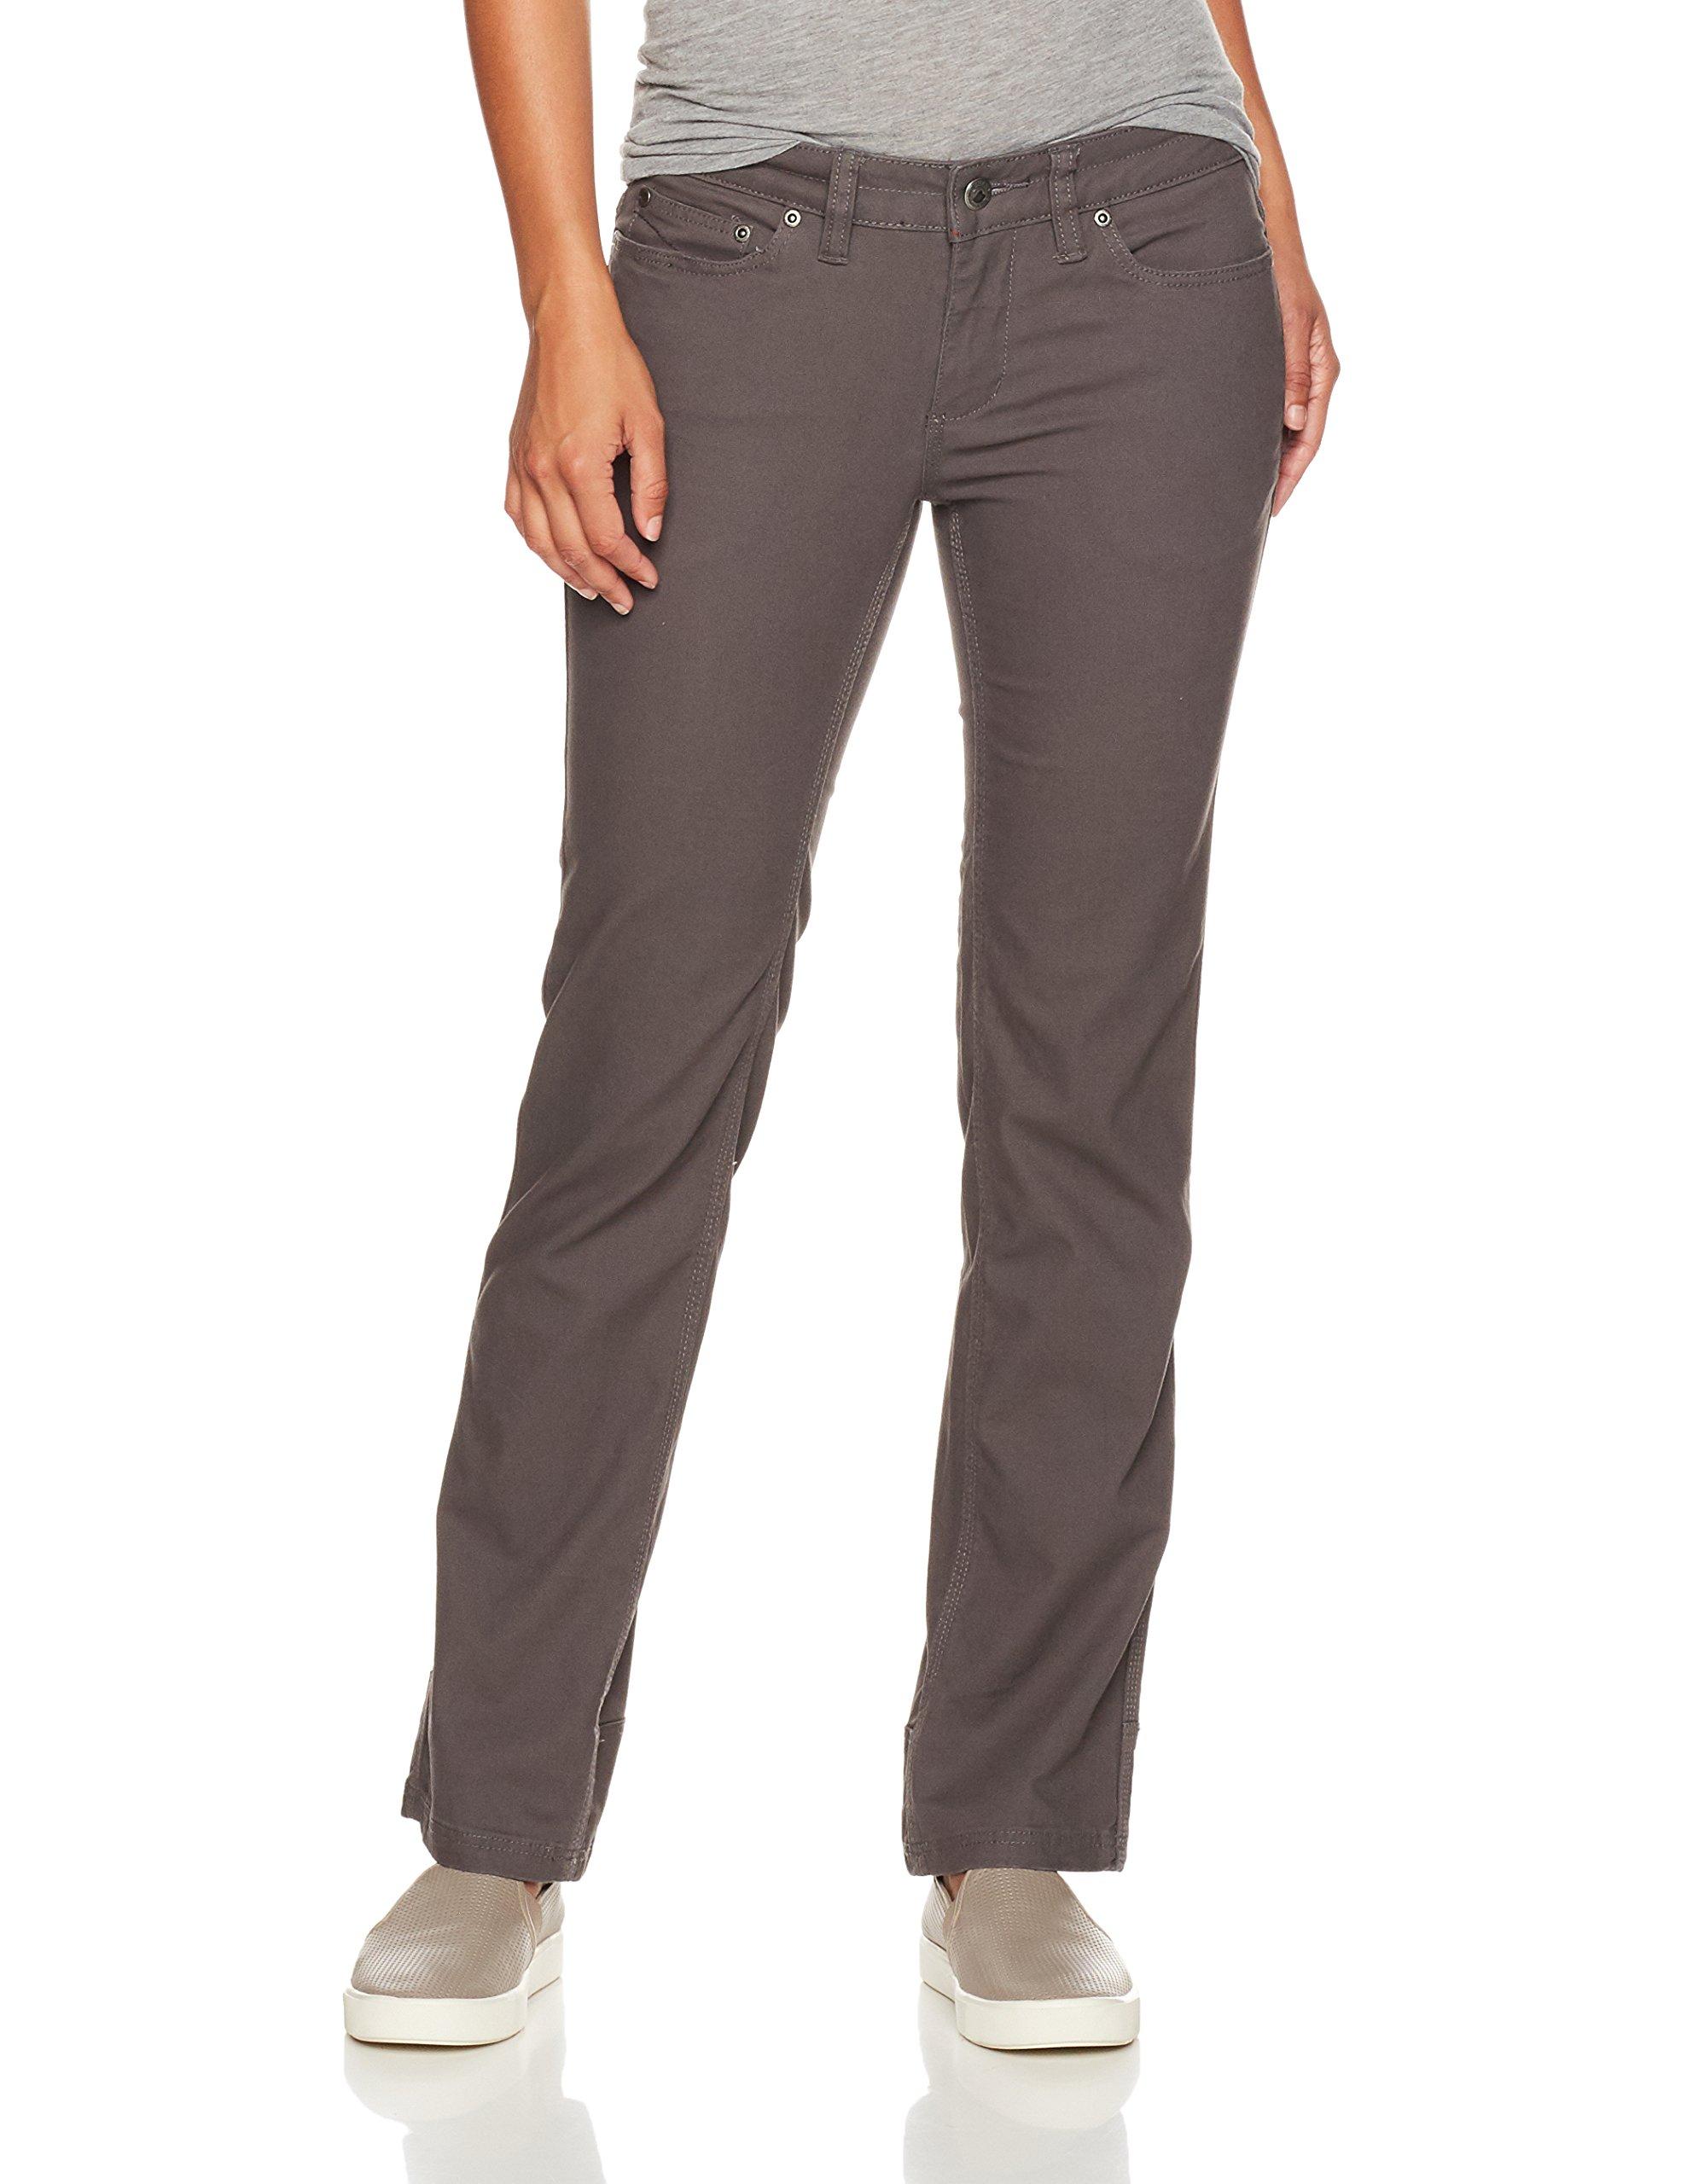 Mountain Khakis Women's Camber 106 Pant Classic Fit, Slate, 0 Regular